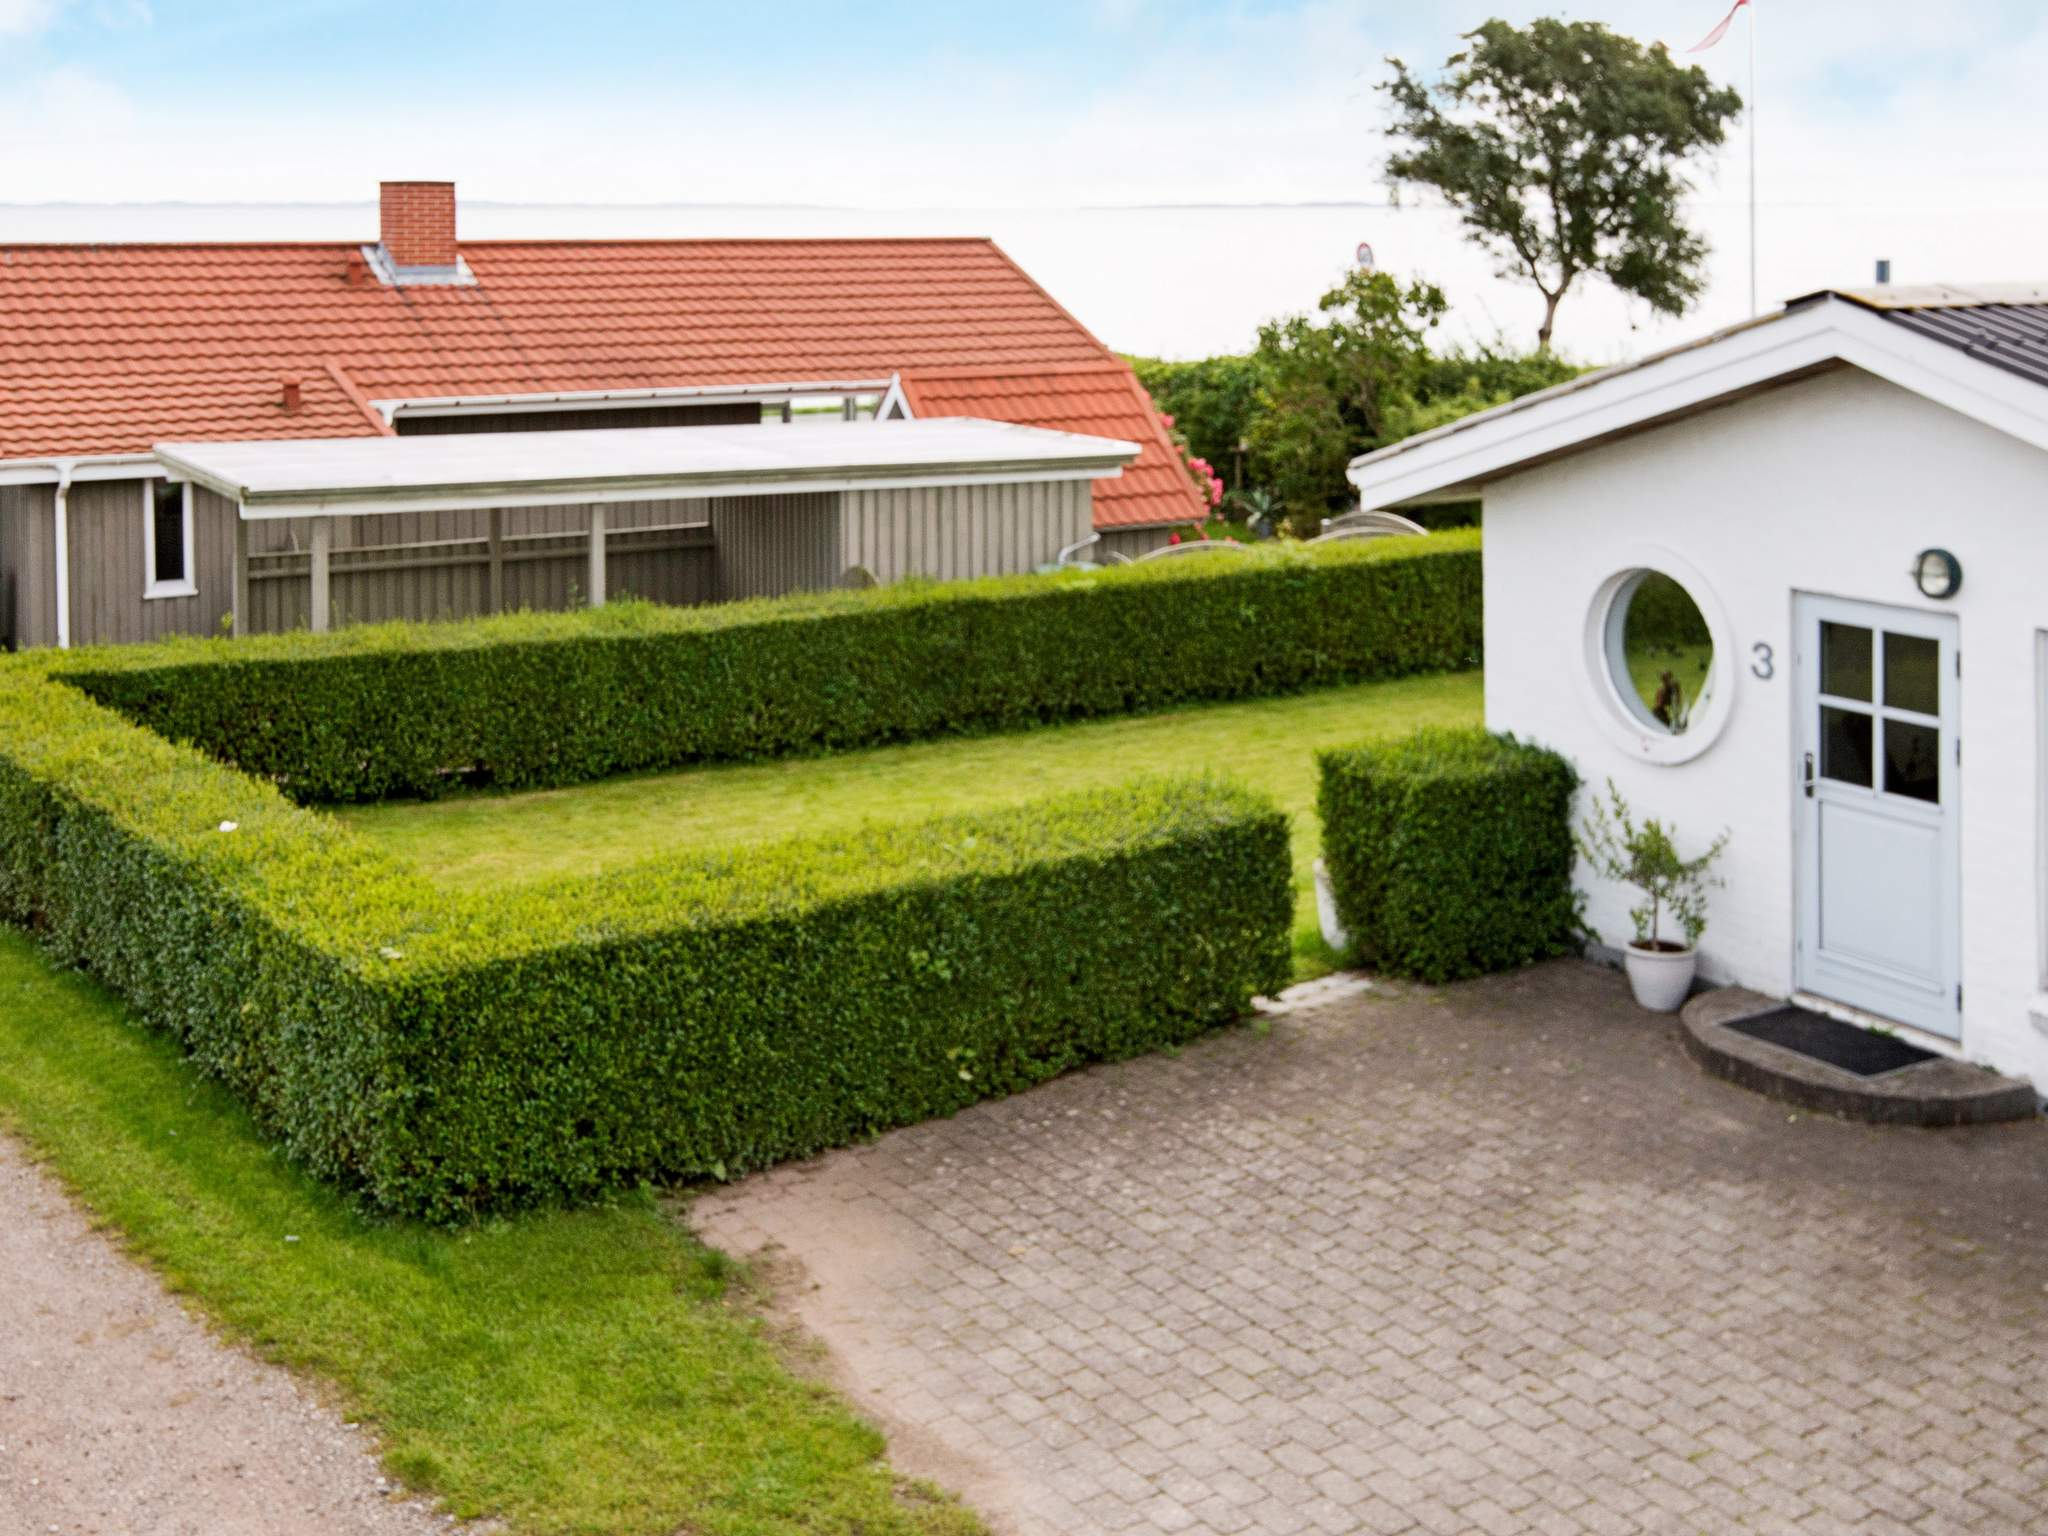 Ferienhaus Ajstrup Strand/Malling (2355032), Ajstrup, , Ostjütland, Dänemark, Bild 15